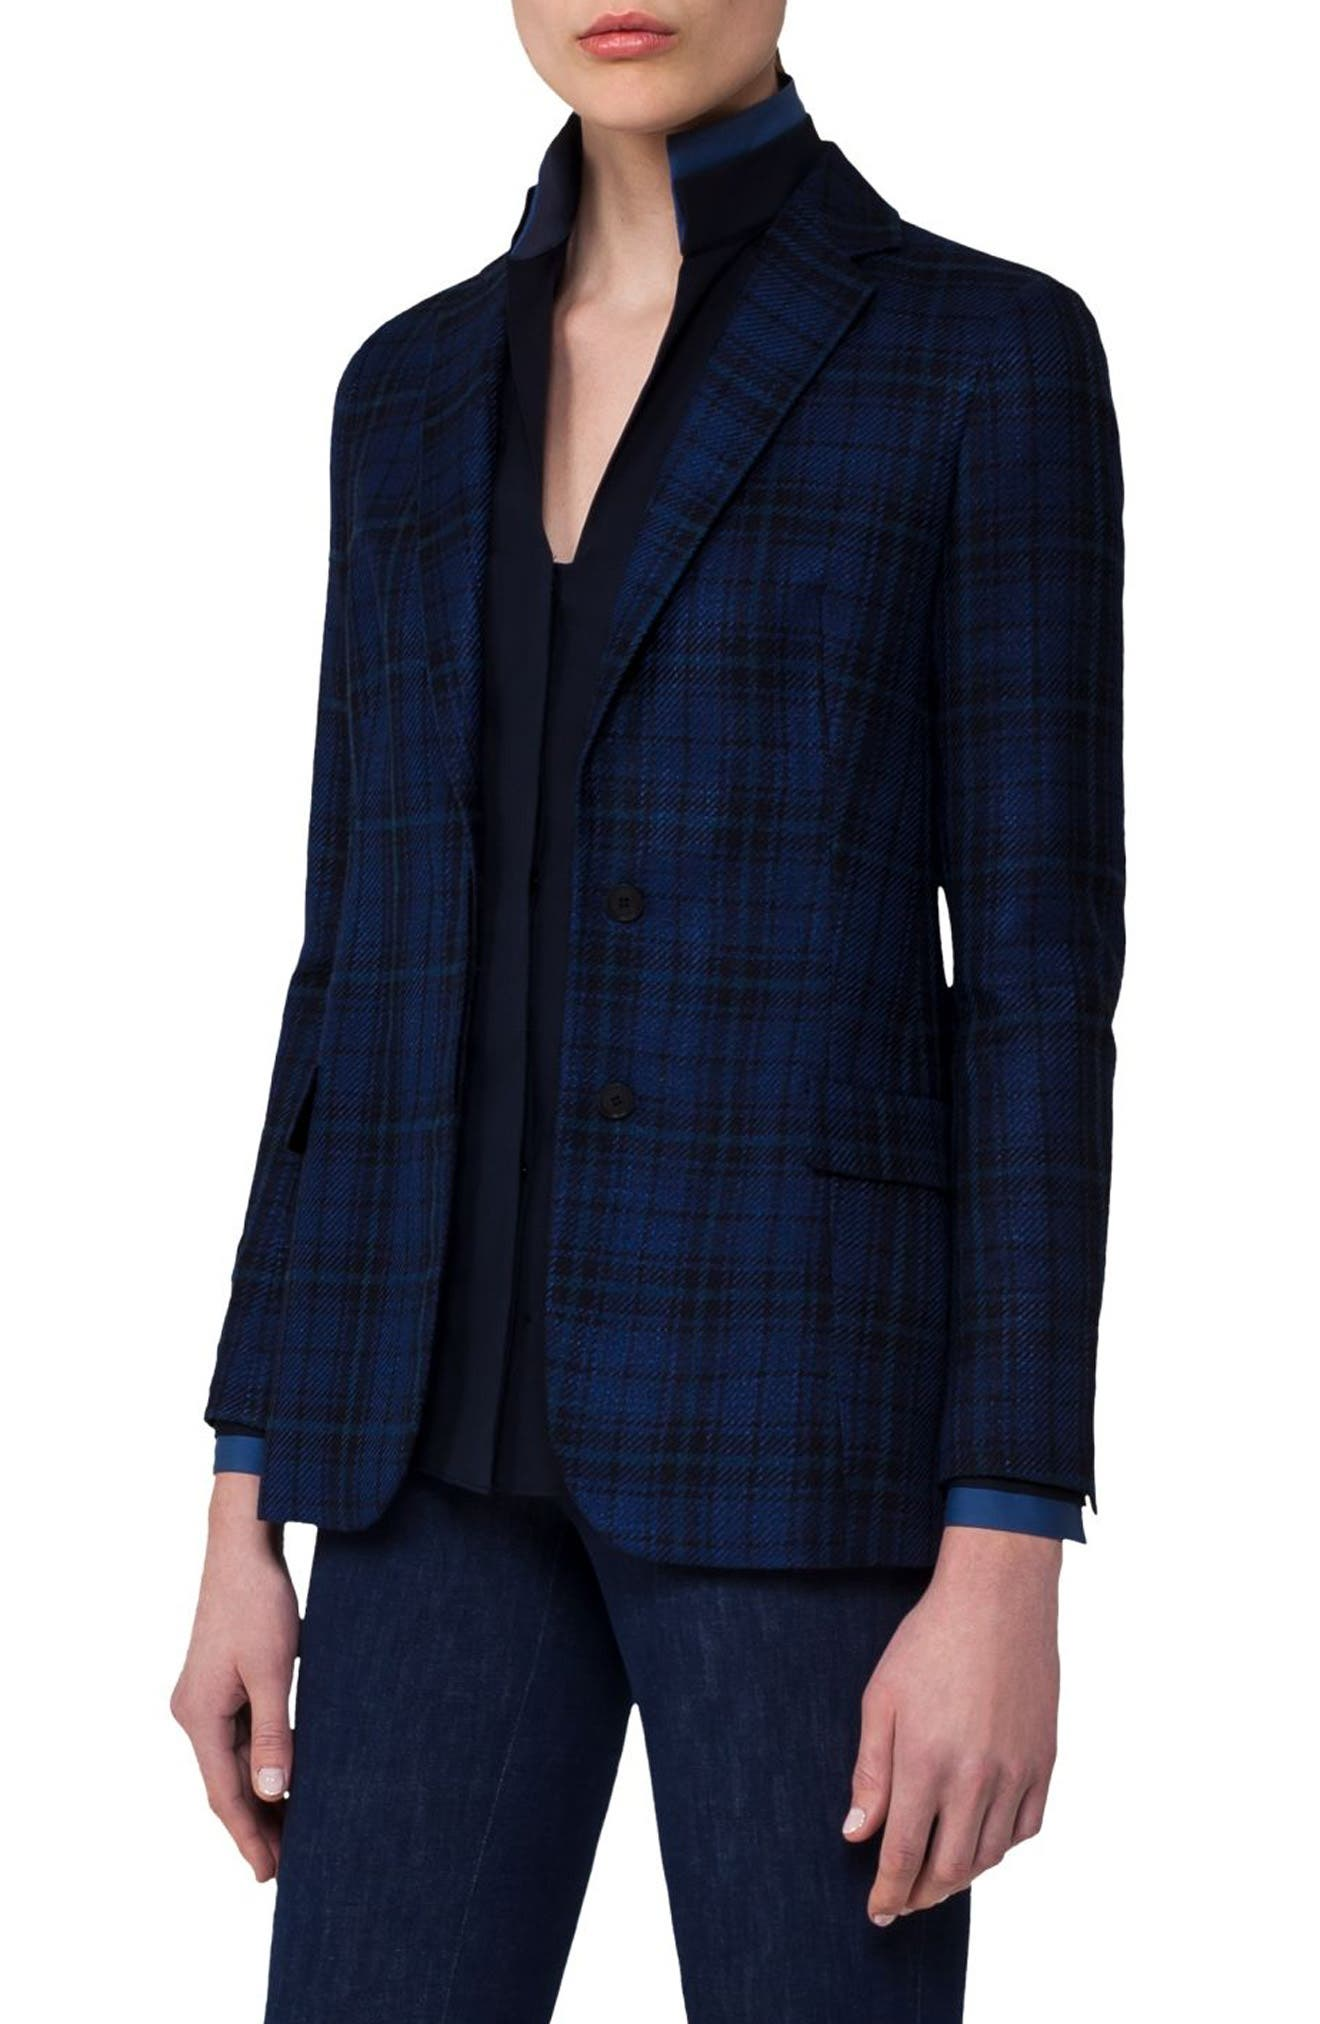 Main Image - Akris Check Silk & Cotton Jacket